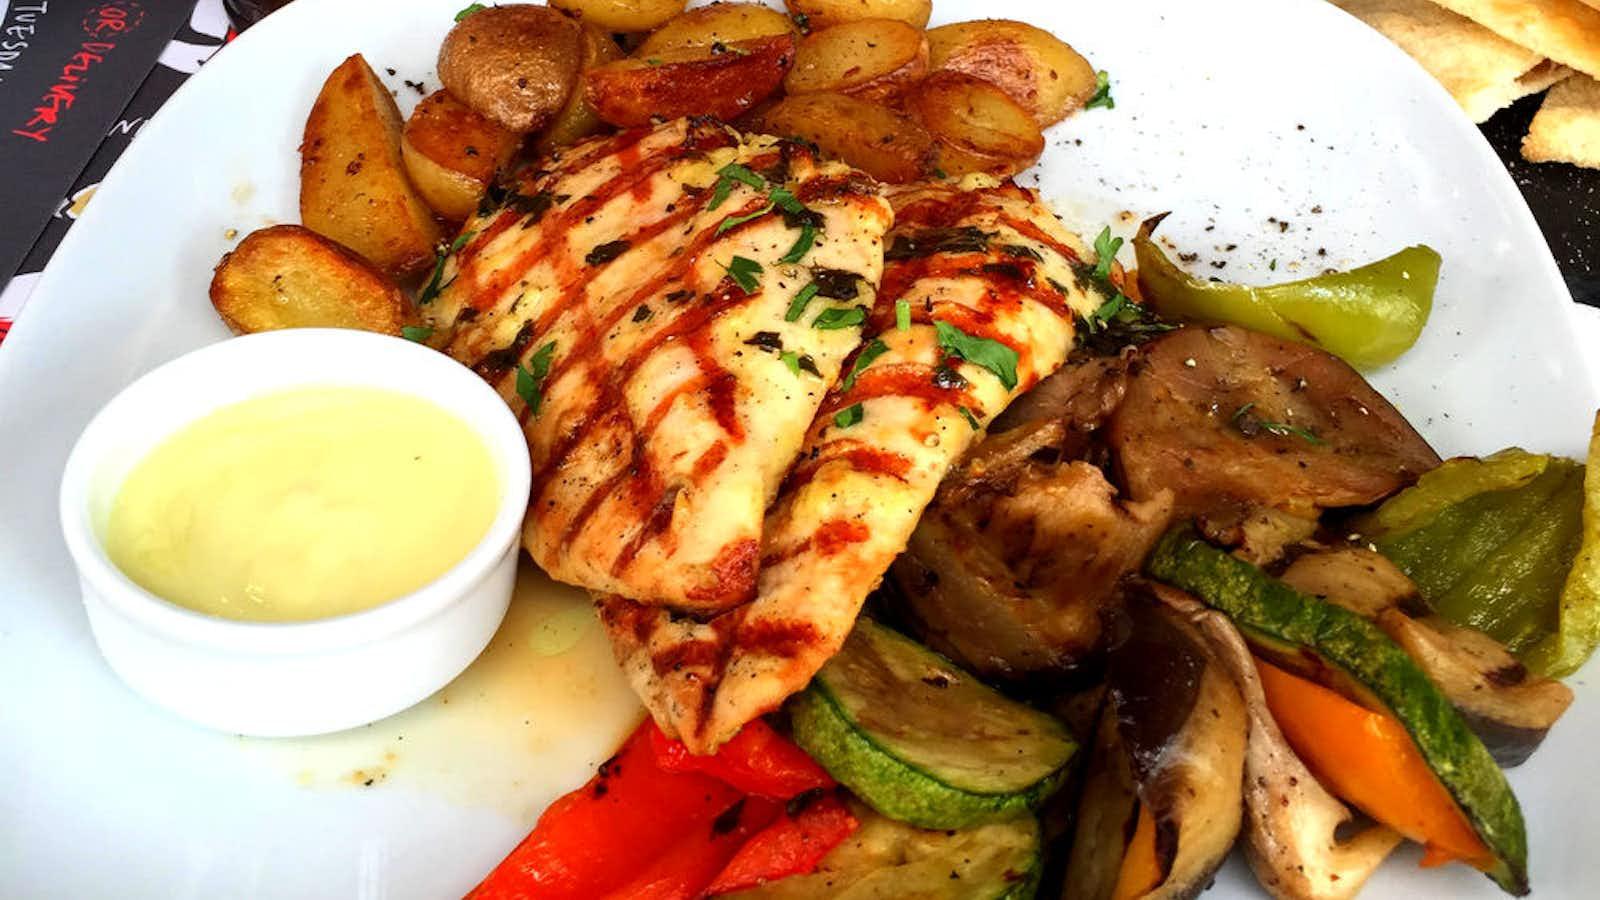 Delicious food in Greece